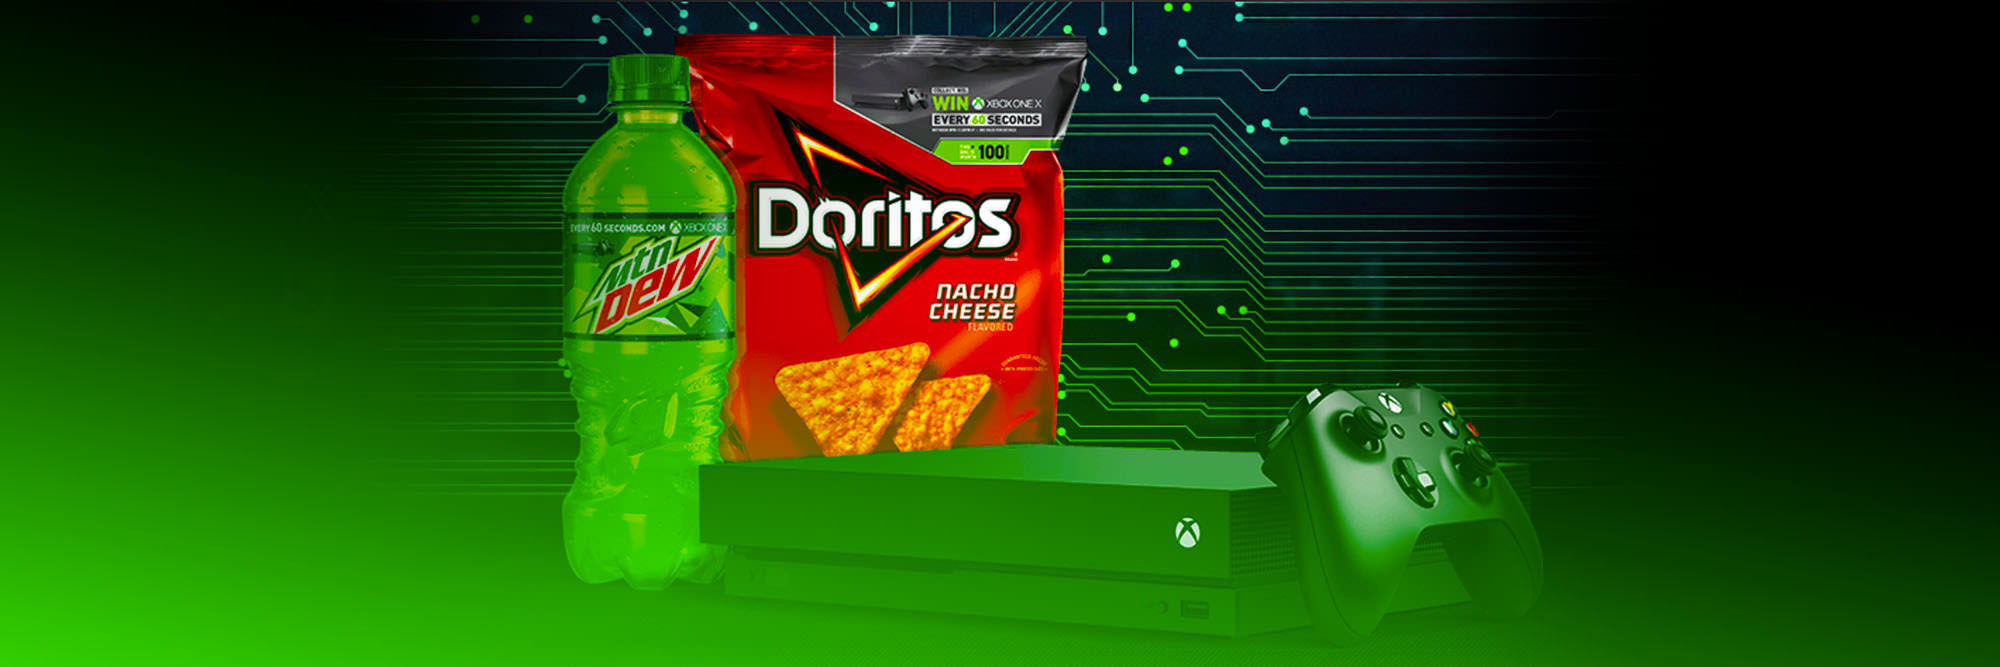 Xbox Live Doritos